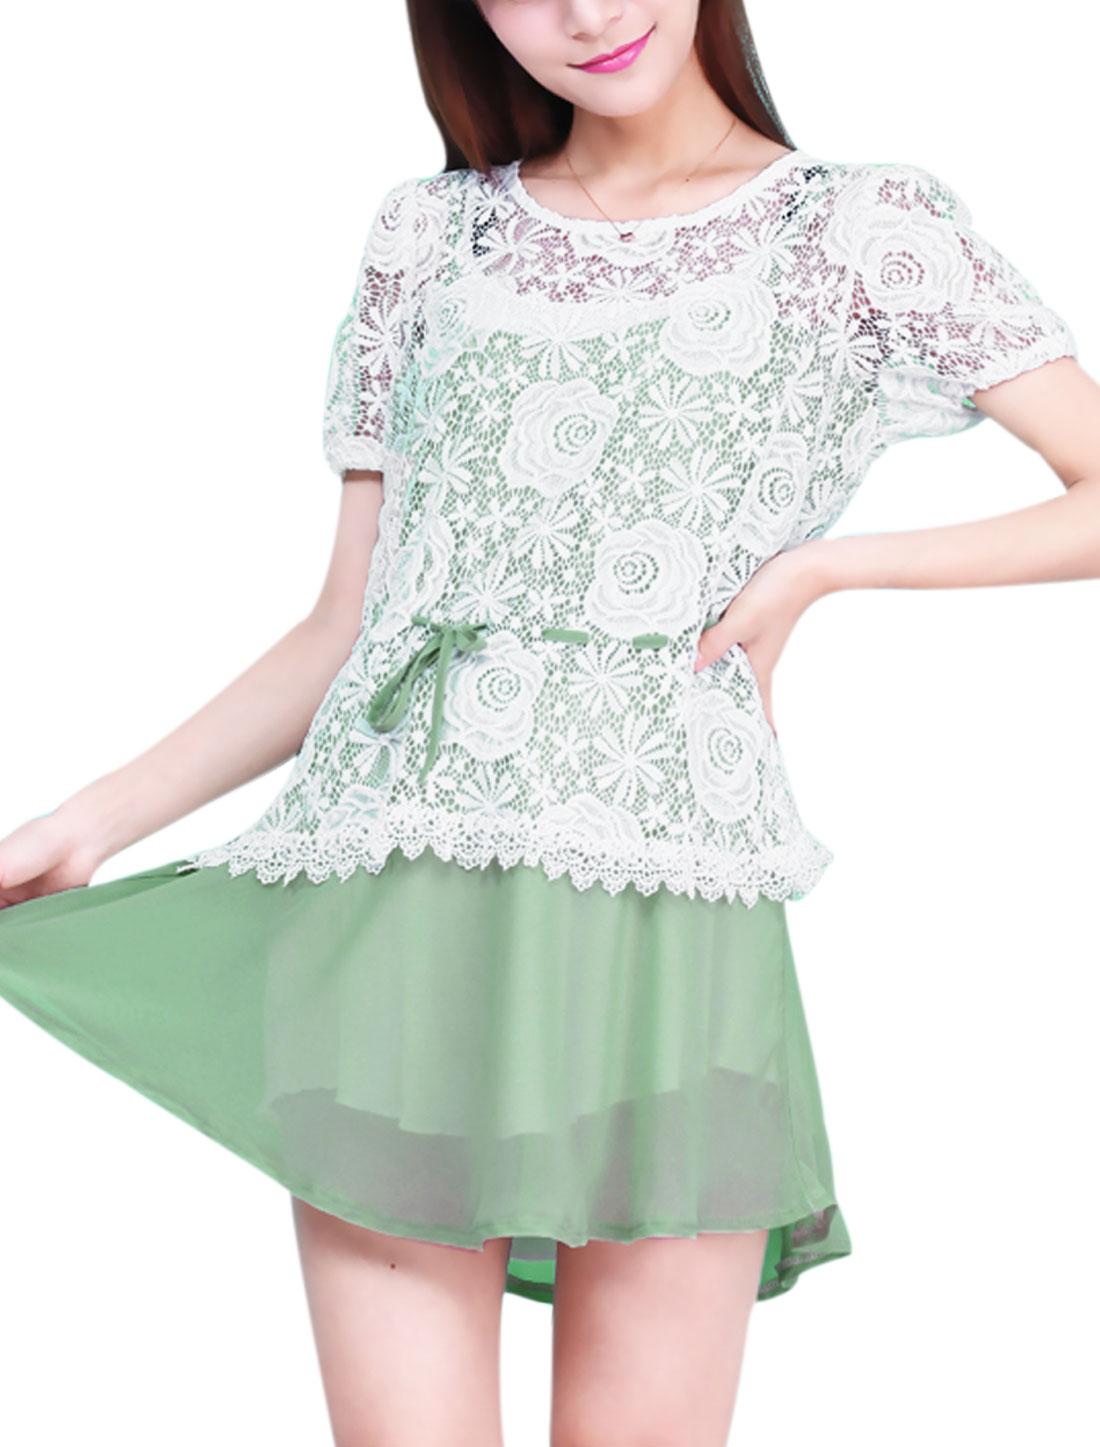 Maternity Crochet Splicing Flower Design Lining Sweet Chiffon Dress Light Green White XS